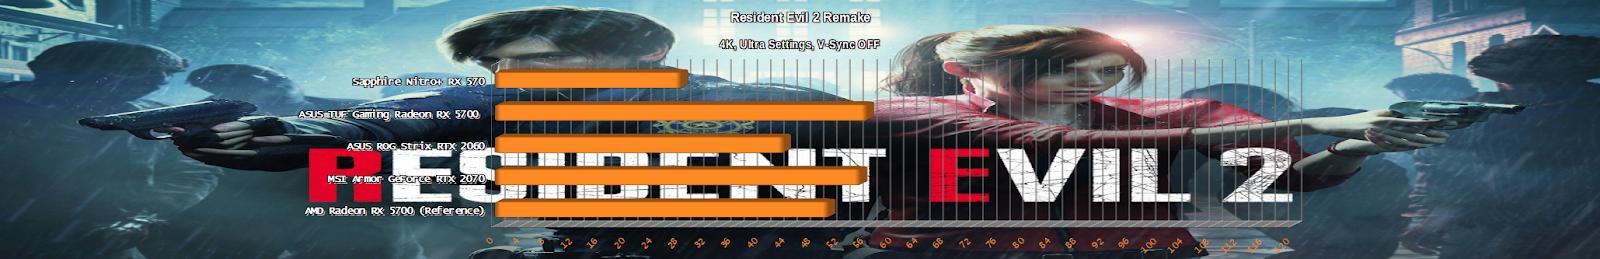 AMD Radeon RX 5700 Resident Evil 2 Remake Review Benchmark